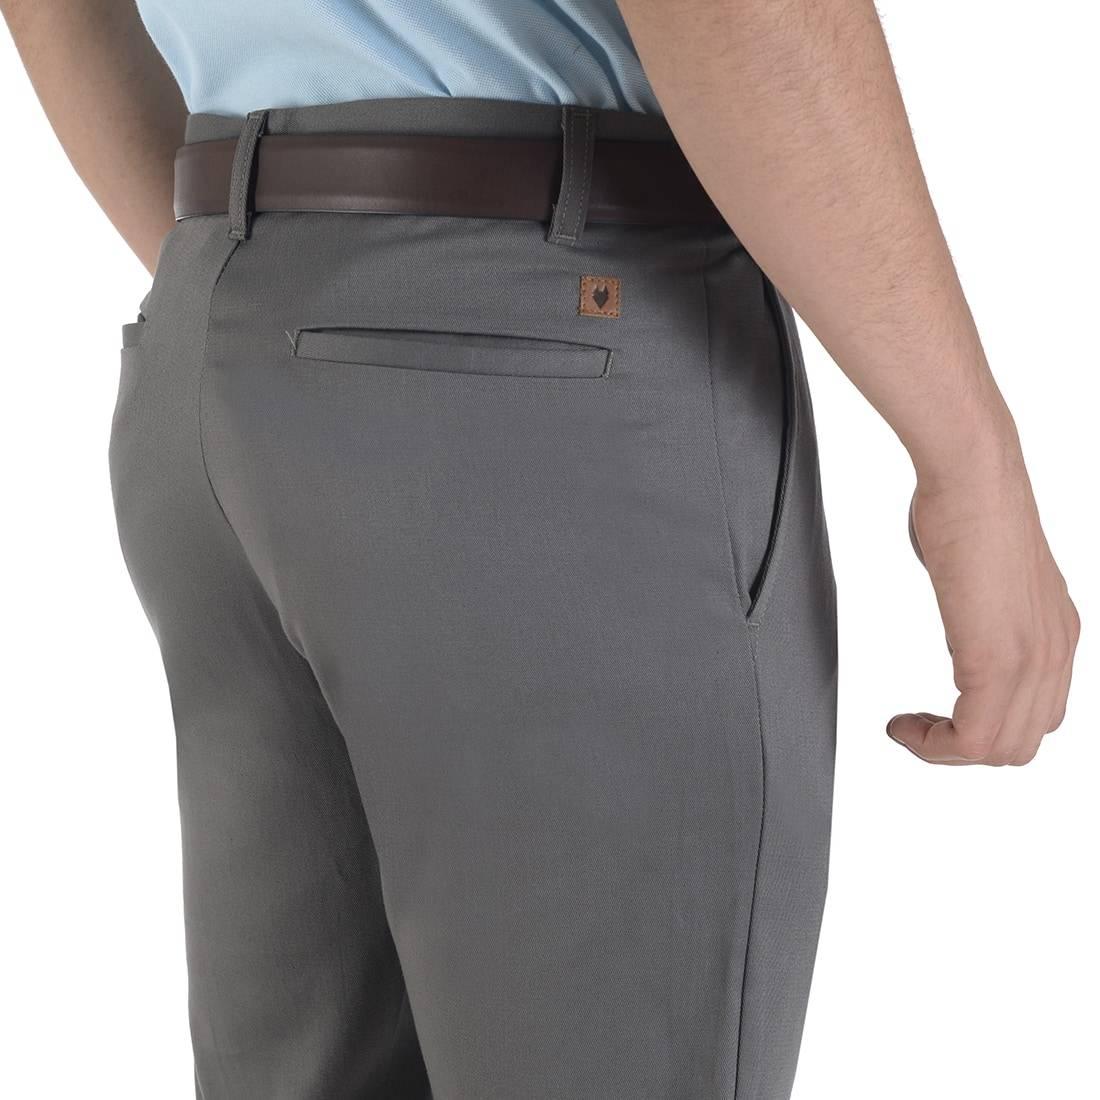 010920418906-04-Pantalon-Casual-Slim-Fit-Oxford-yale